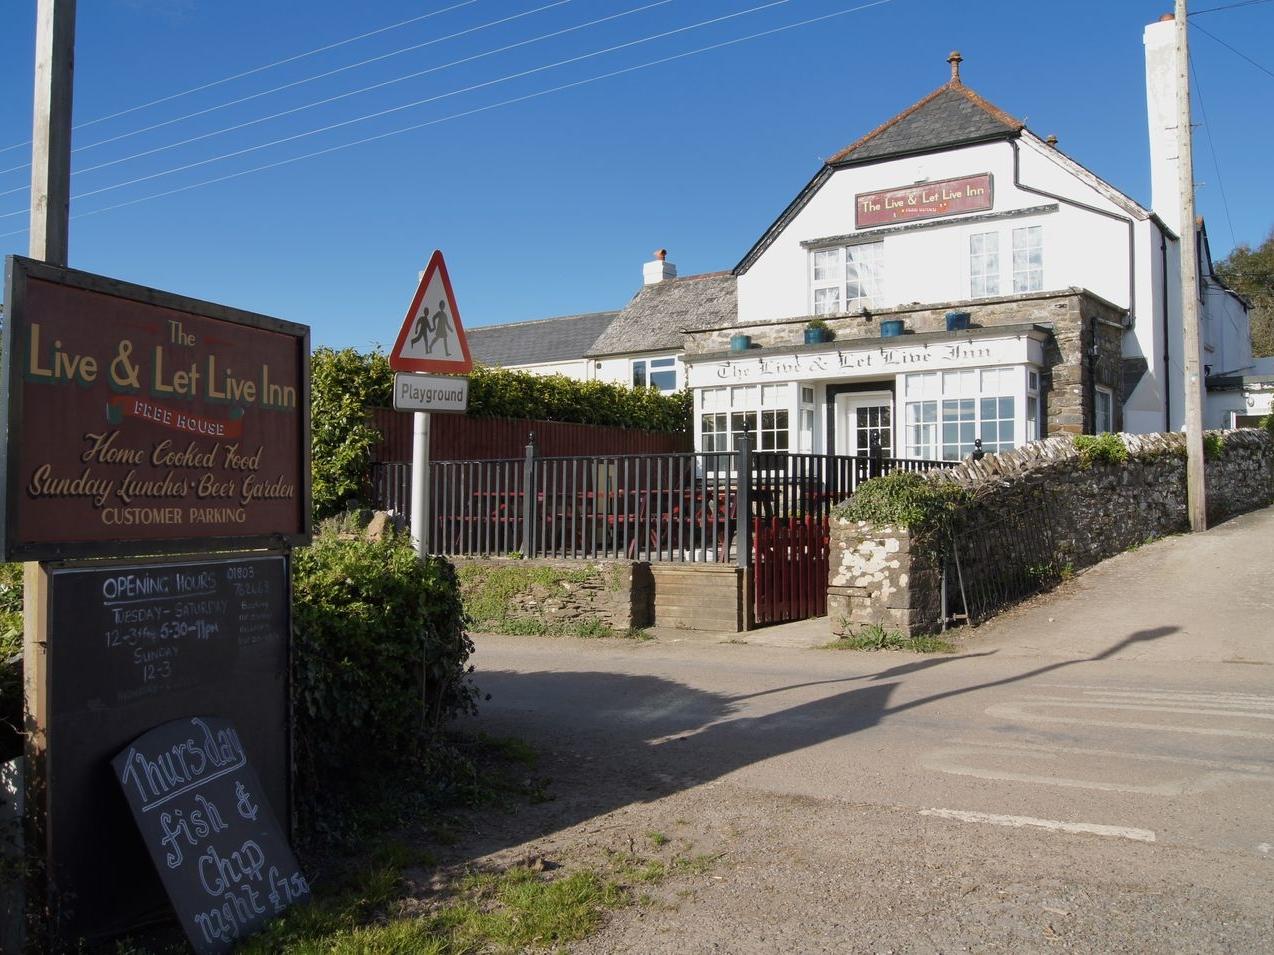 Wolston Cottage